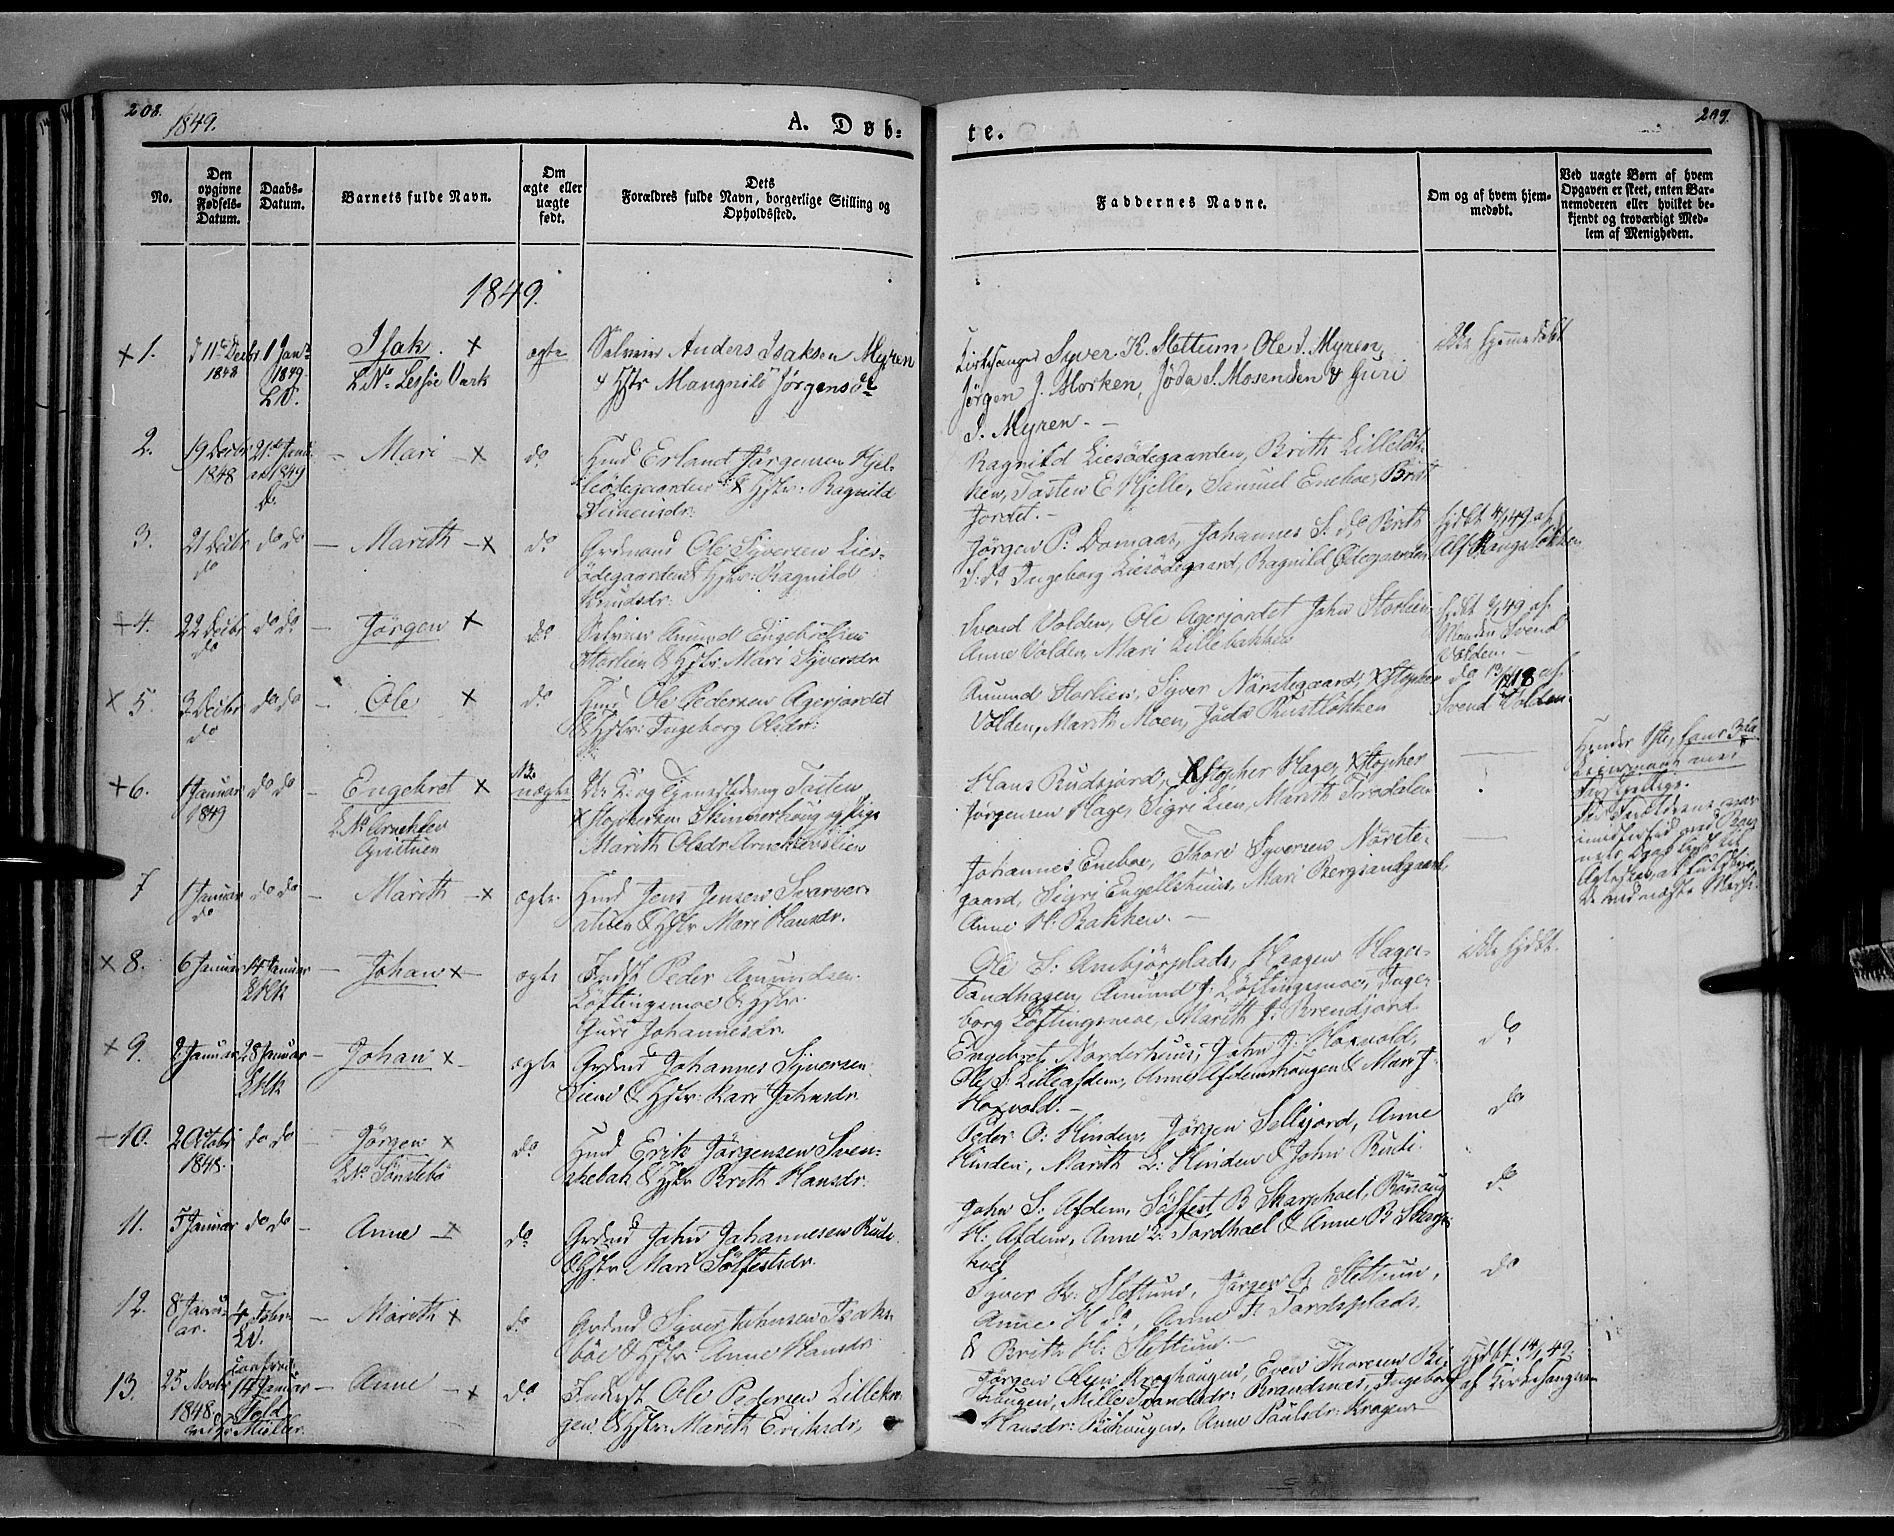 SAH, Lesja prestekontor, Ministerialbok nr. 6A, 1843-1854, s. 208-209